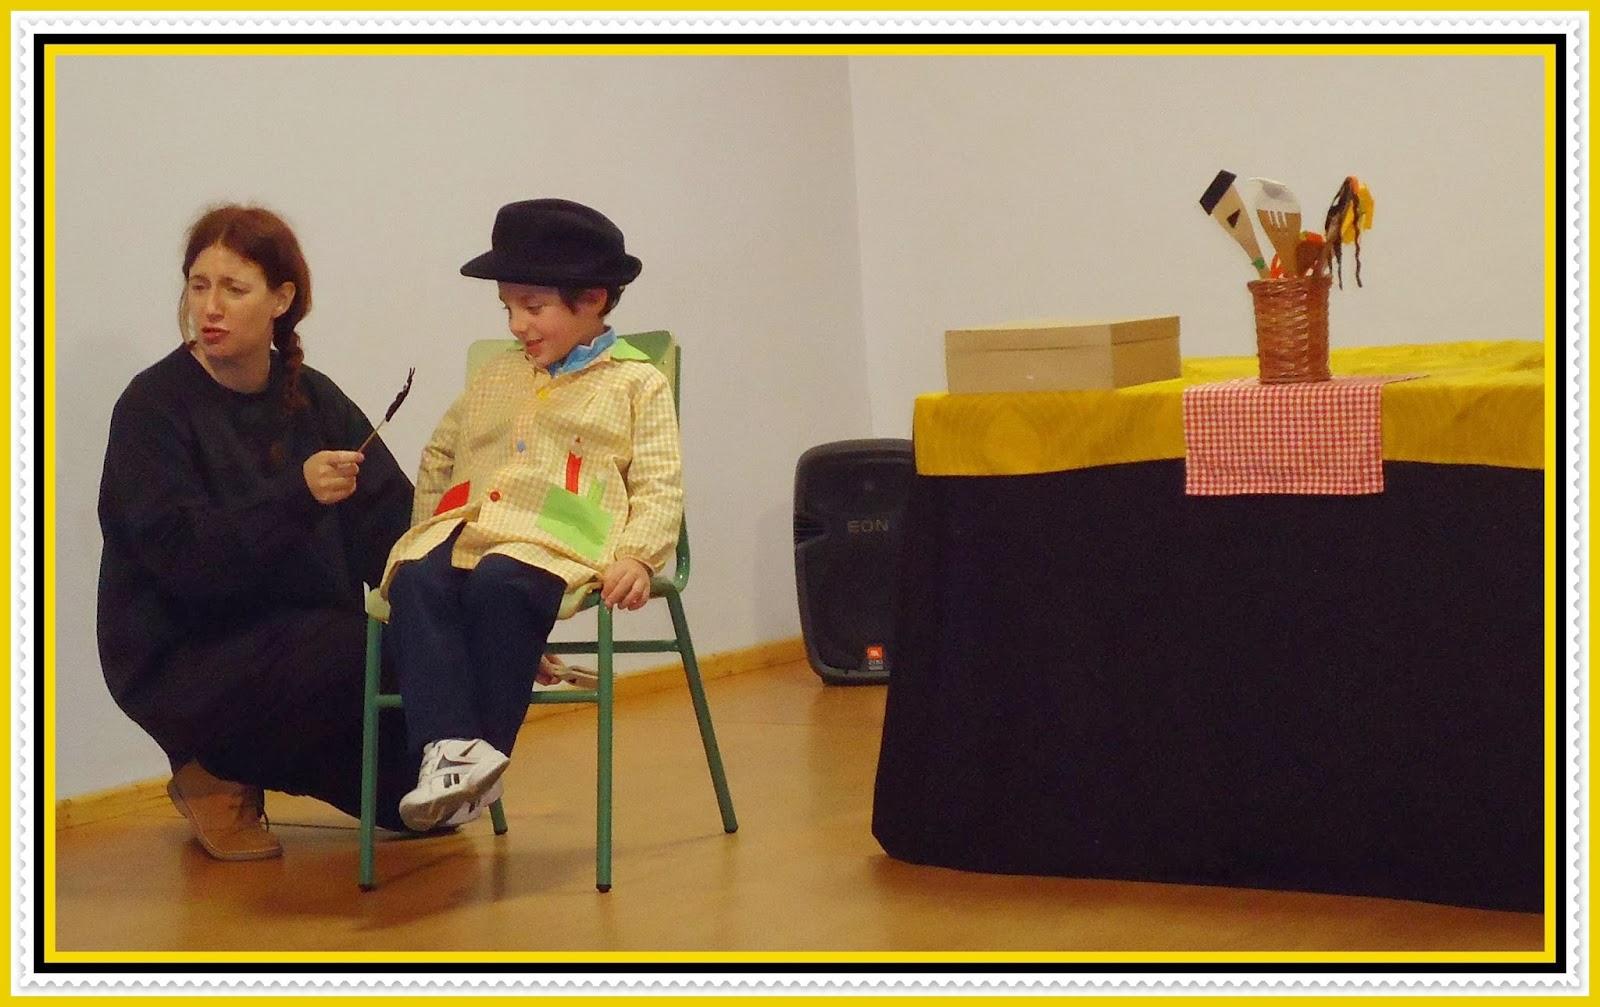 http://chouzouno.blogspot.com.es/2014/02/a-maleta-da-avoa.html